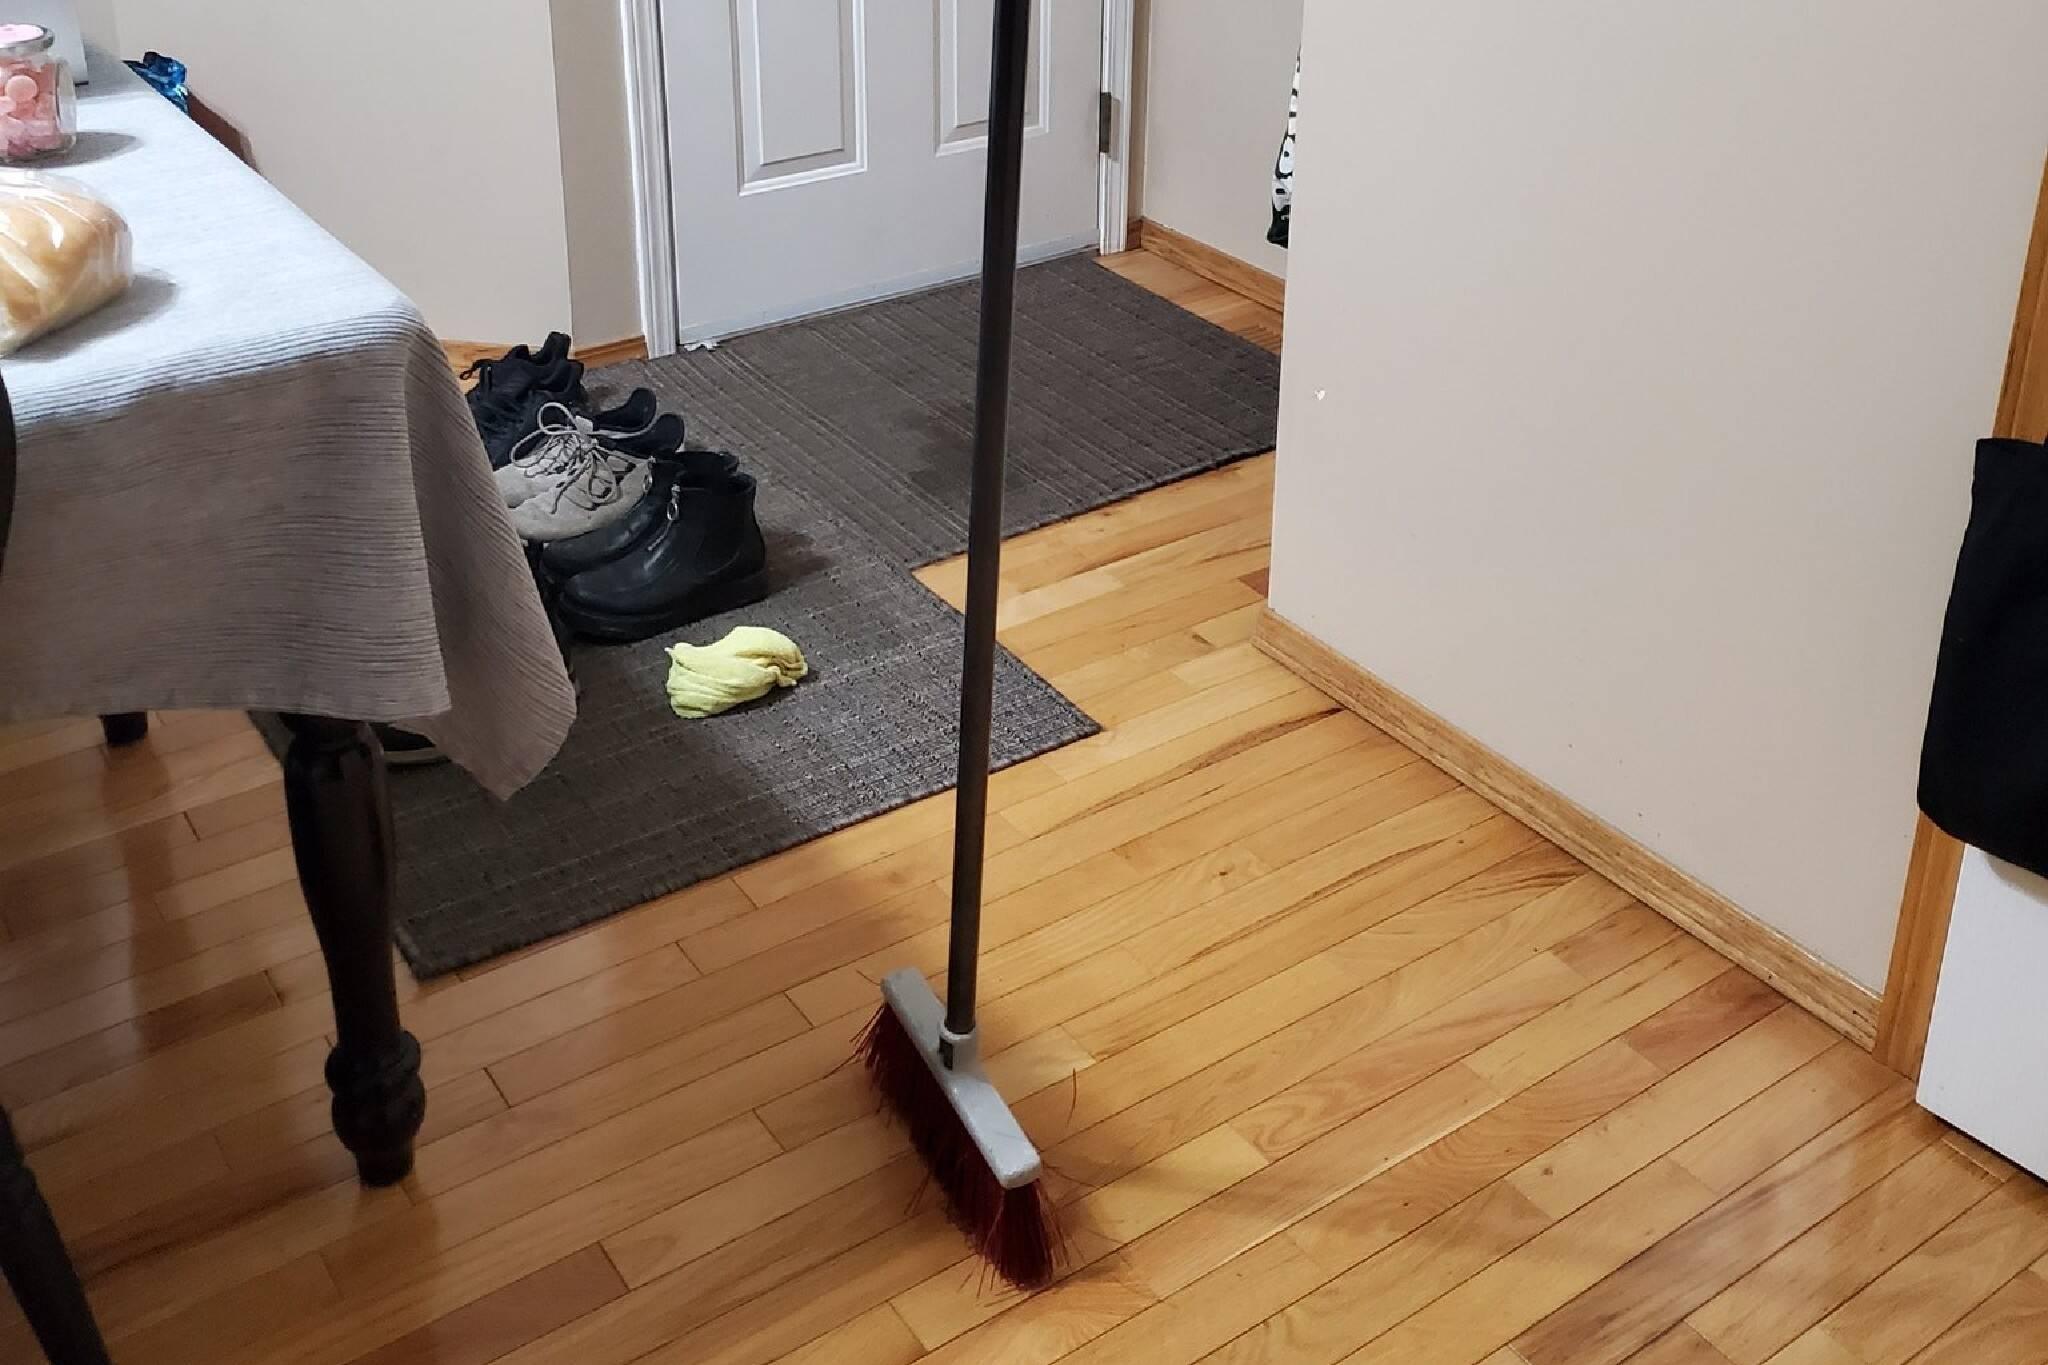 broomstick challenge nasa